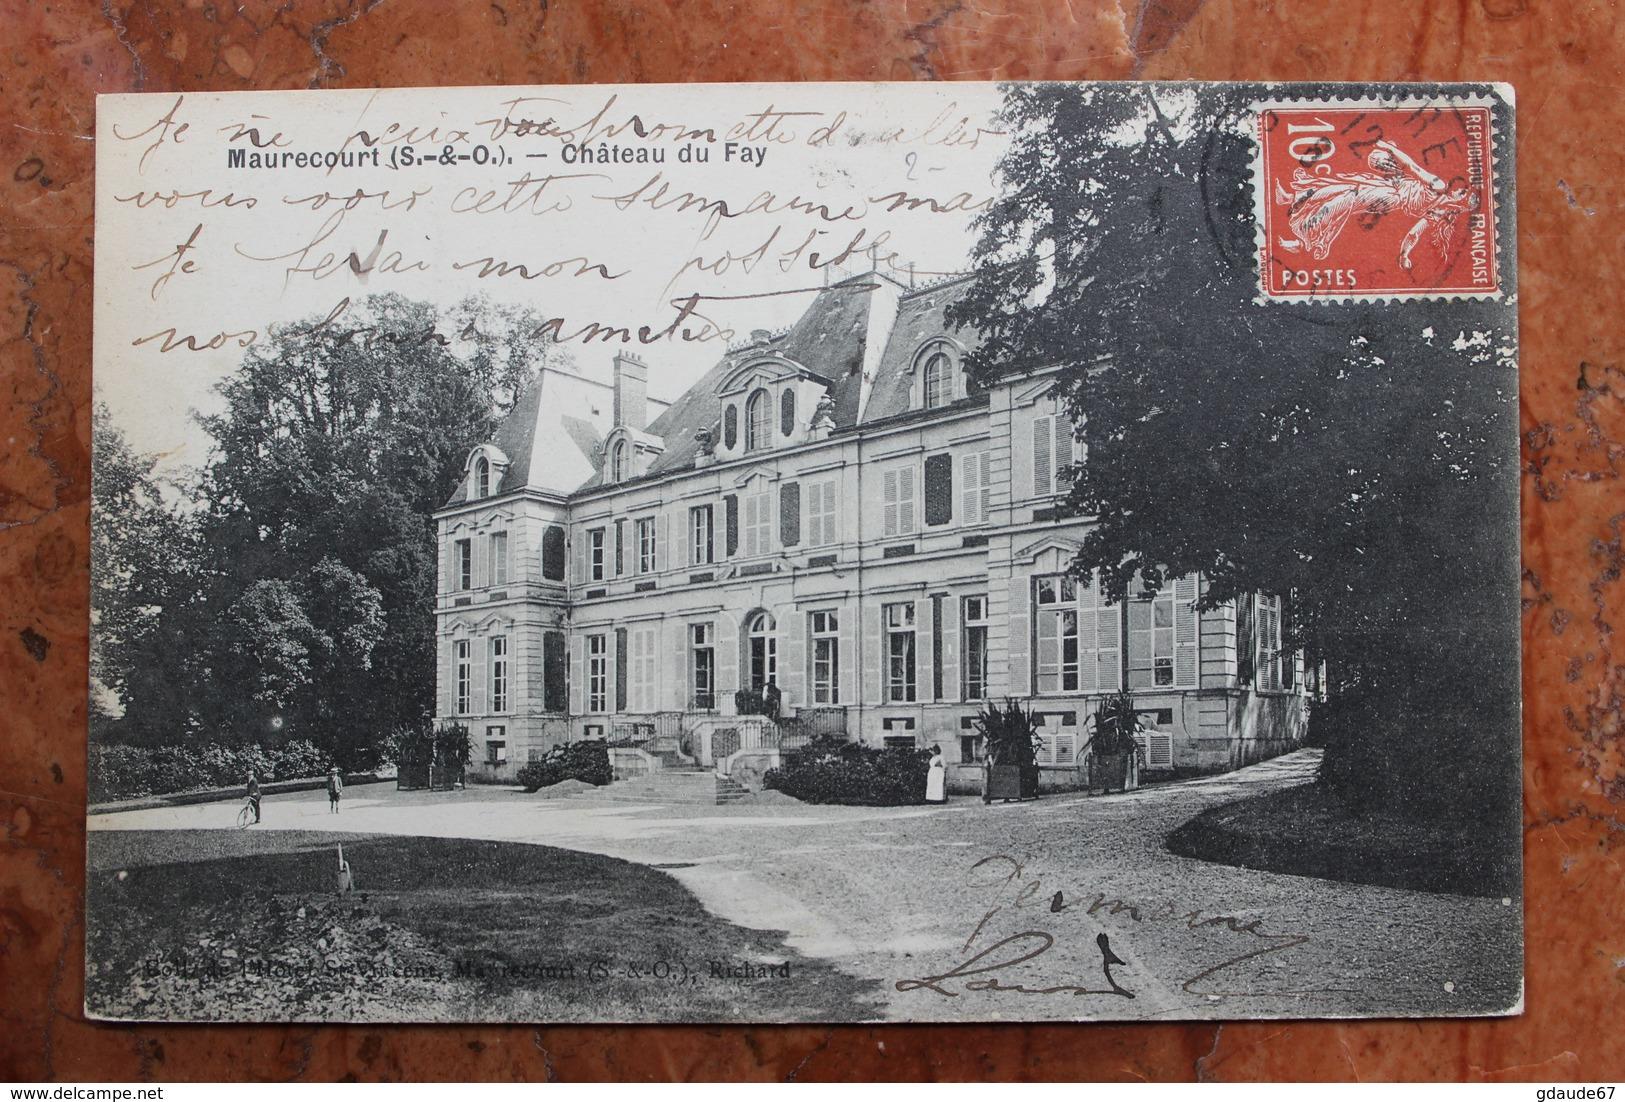 MAURECOURT (78) - CHATEAU DU FAY - Maurecourt